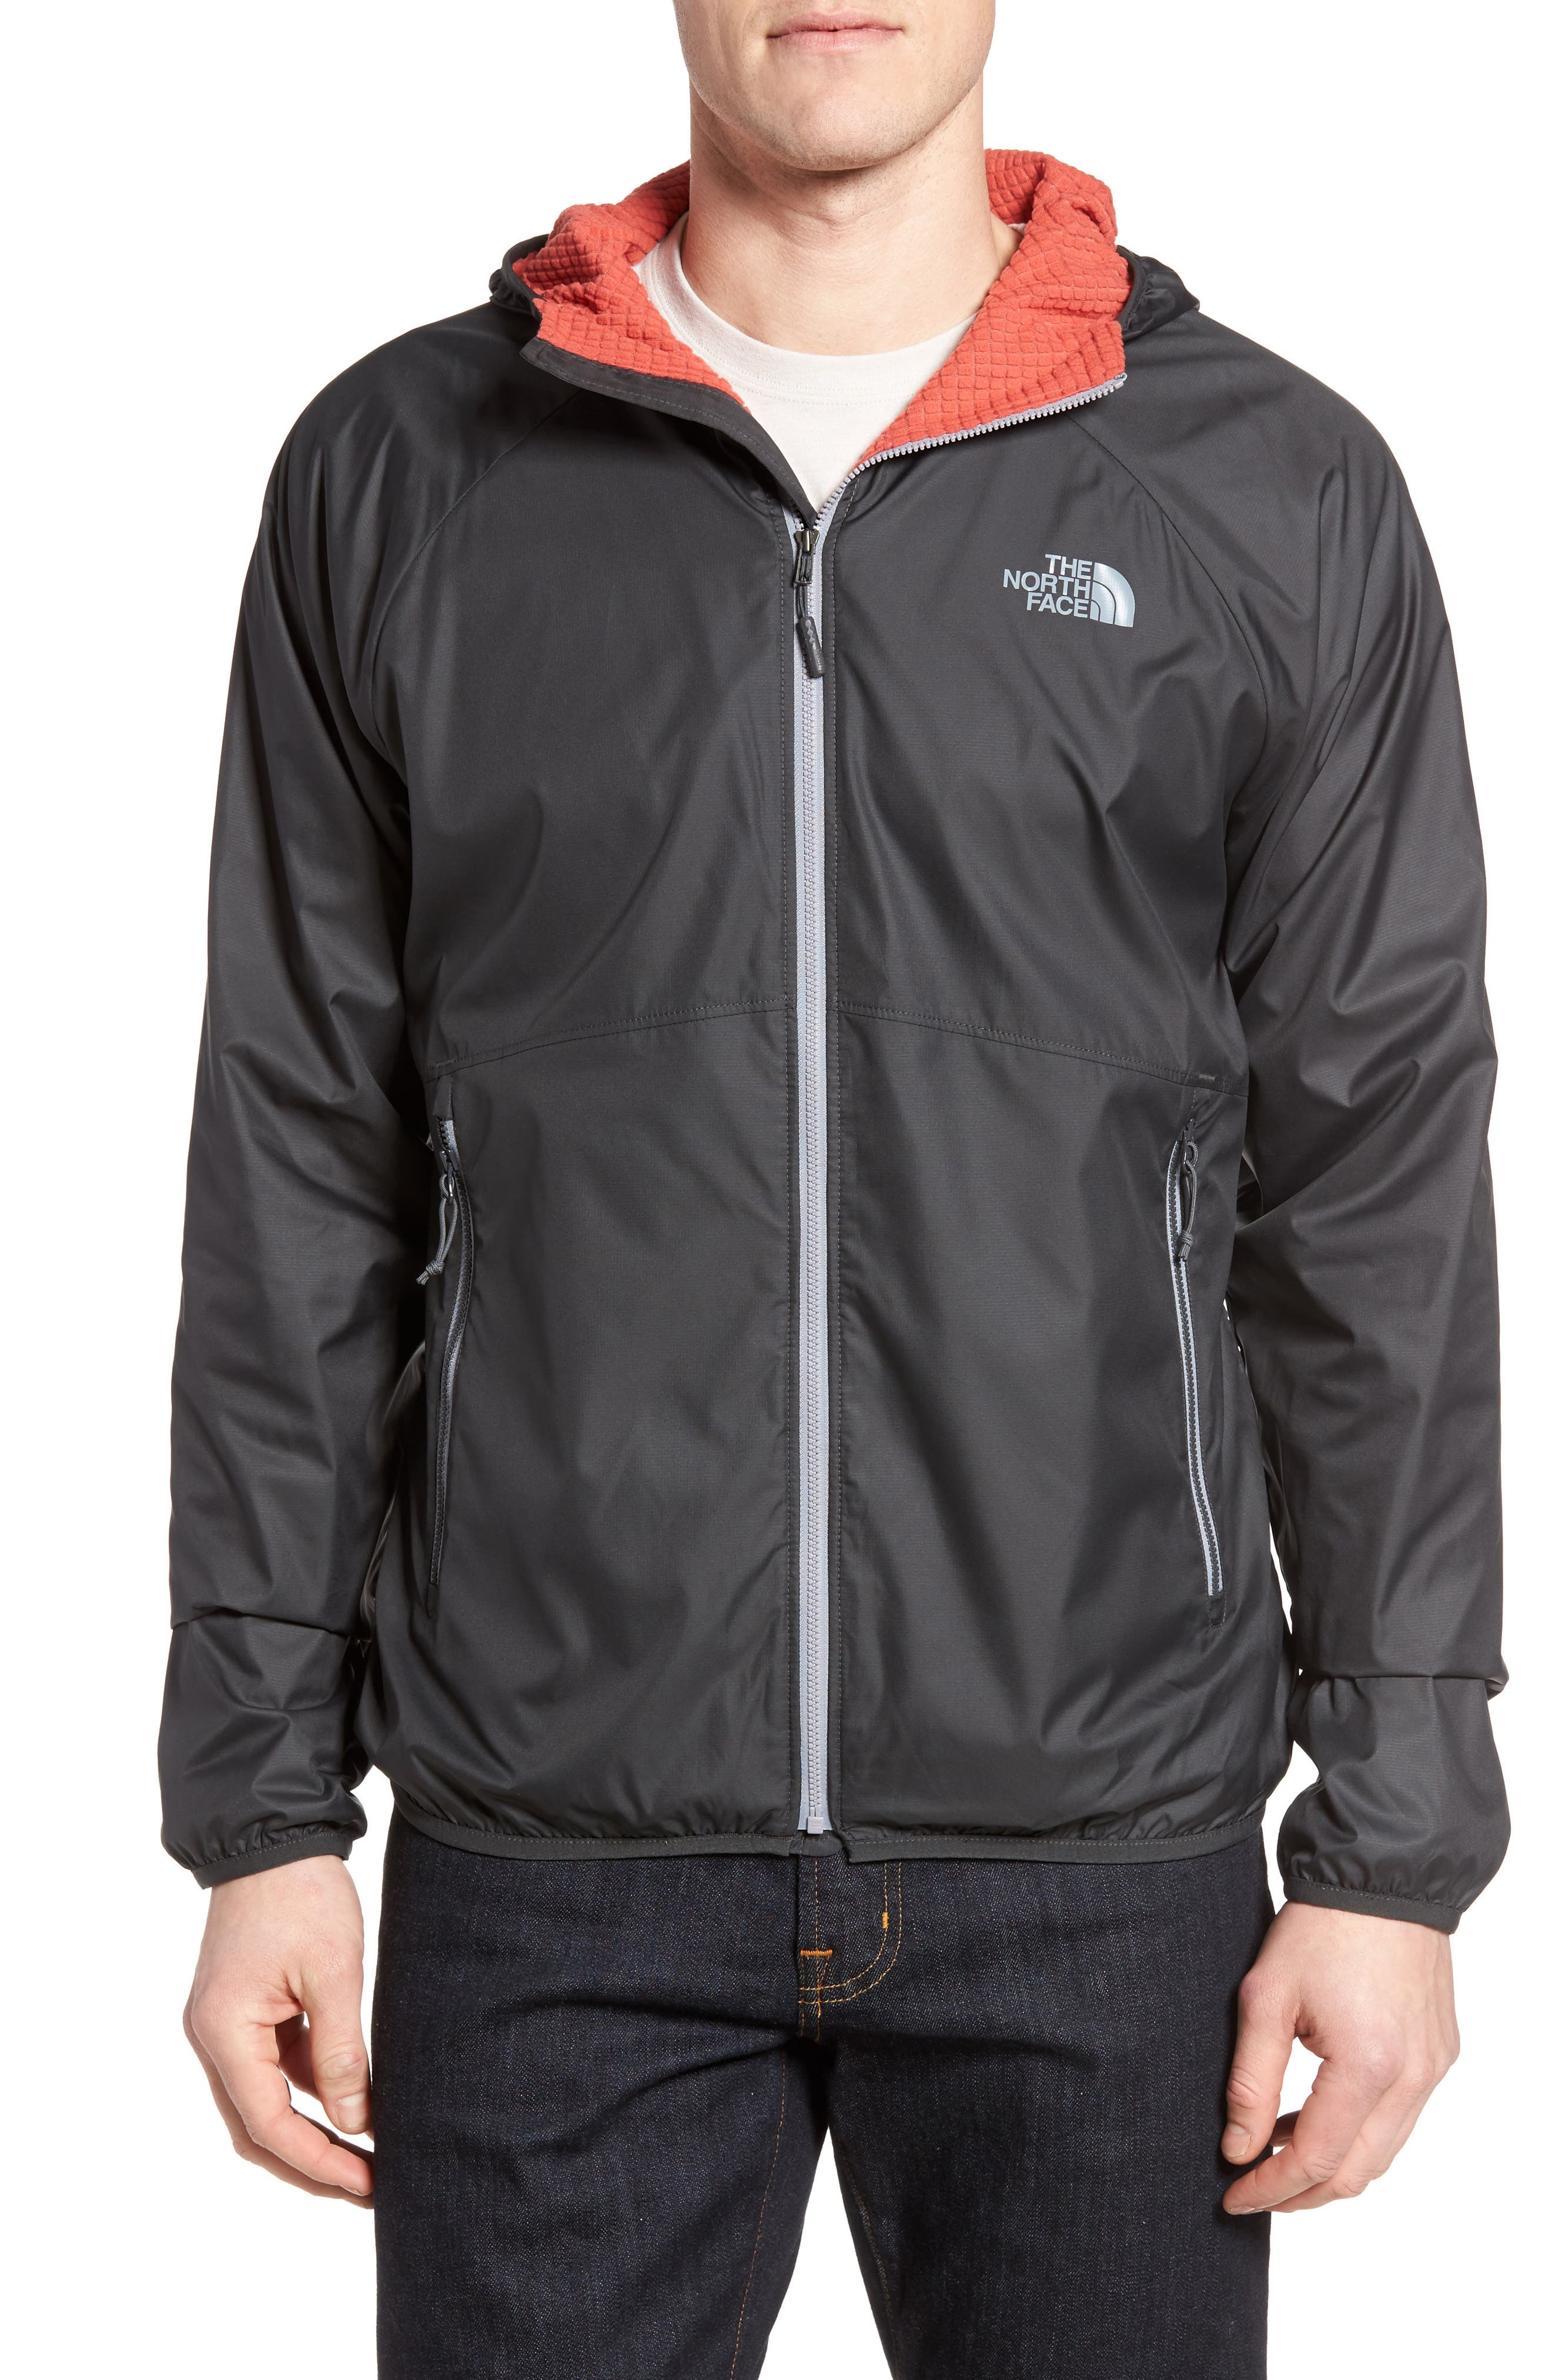 Main Image - The North Face Desmond WindWall® Jacket